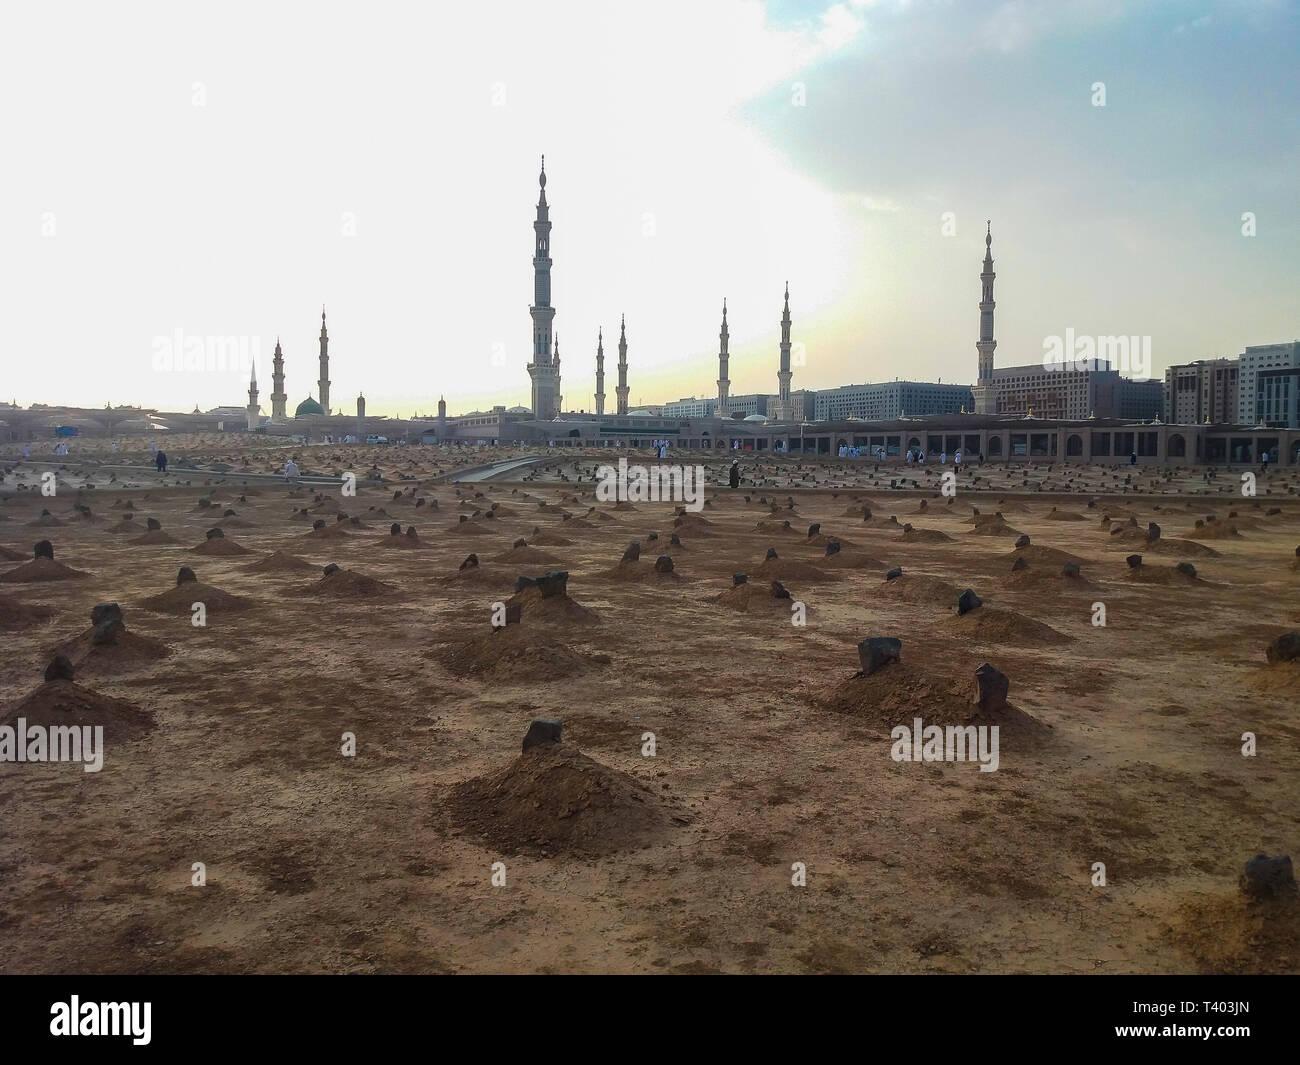 Madinah, Saudi Arabia march 2019, Muslims at Prophet Muhammad's mosque square in Madinah Al-Munawarrah. View of Baqee` Muslim cemetary at Masjid mosqu - Stock Image